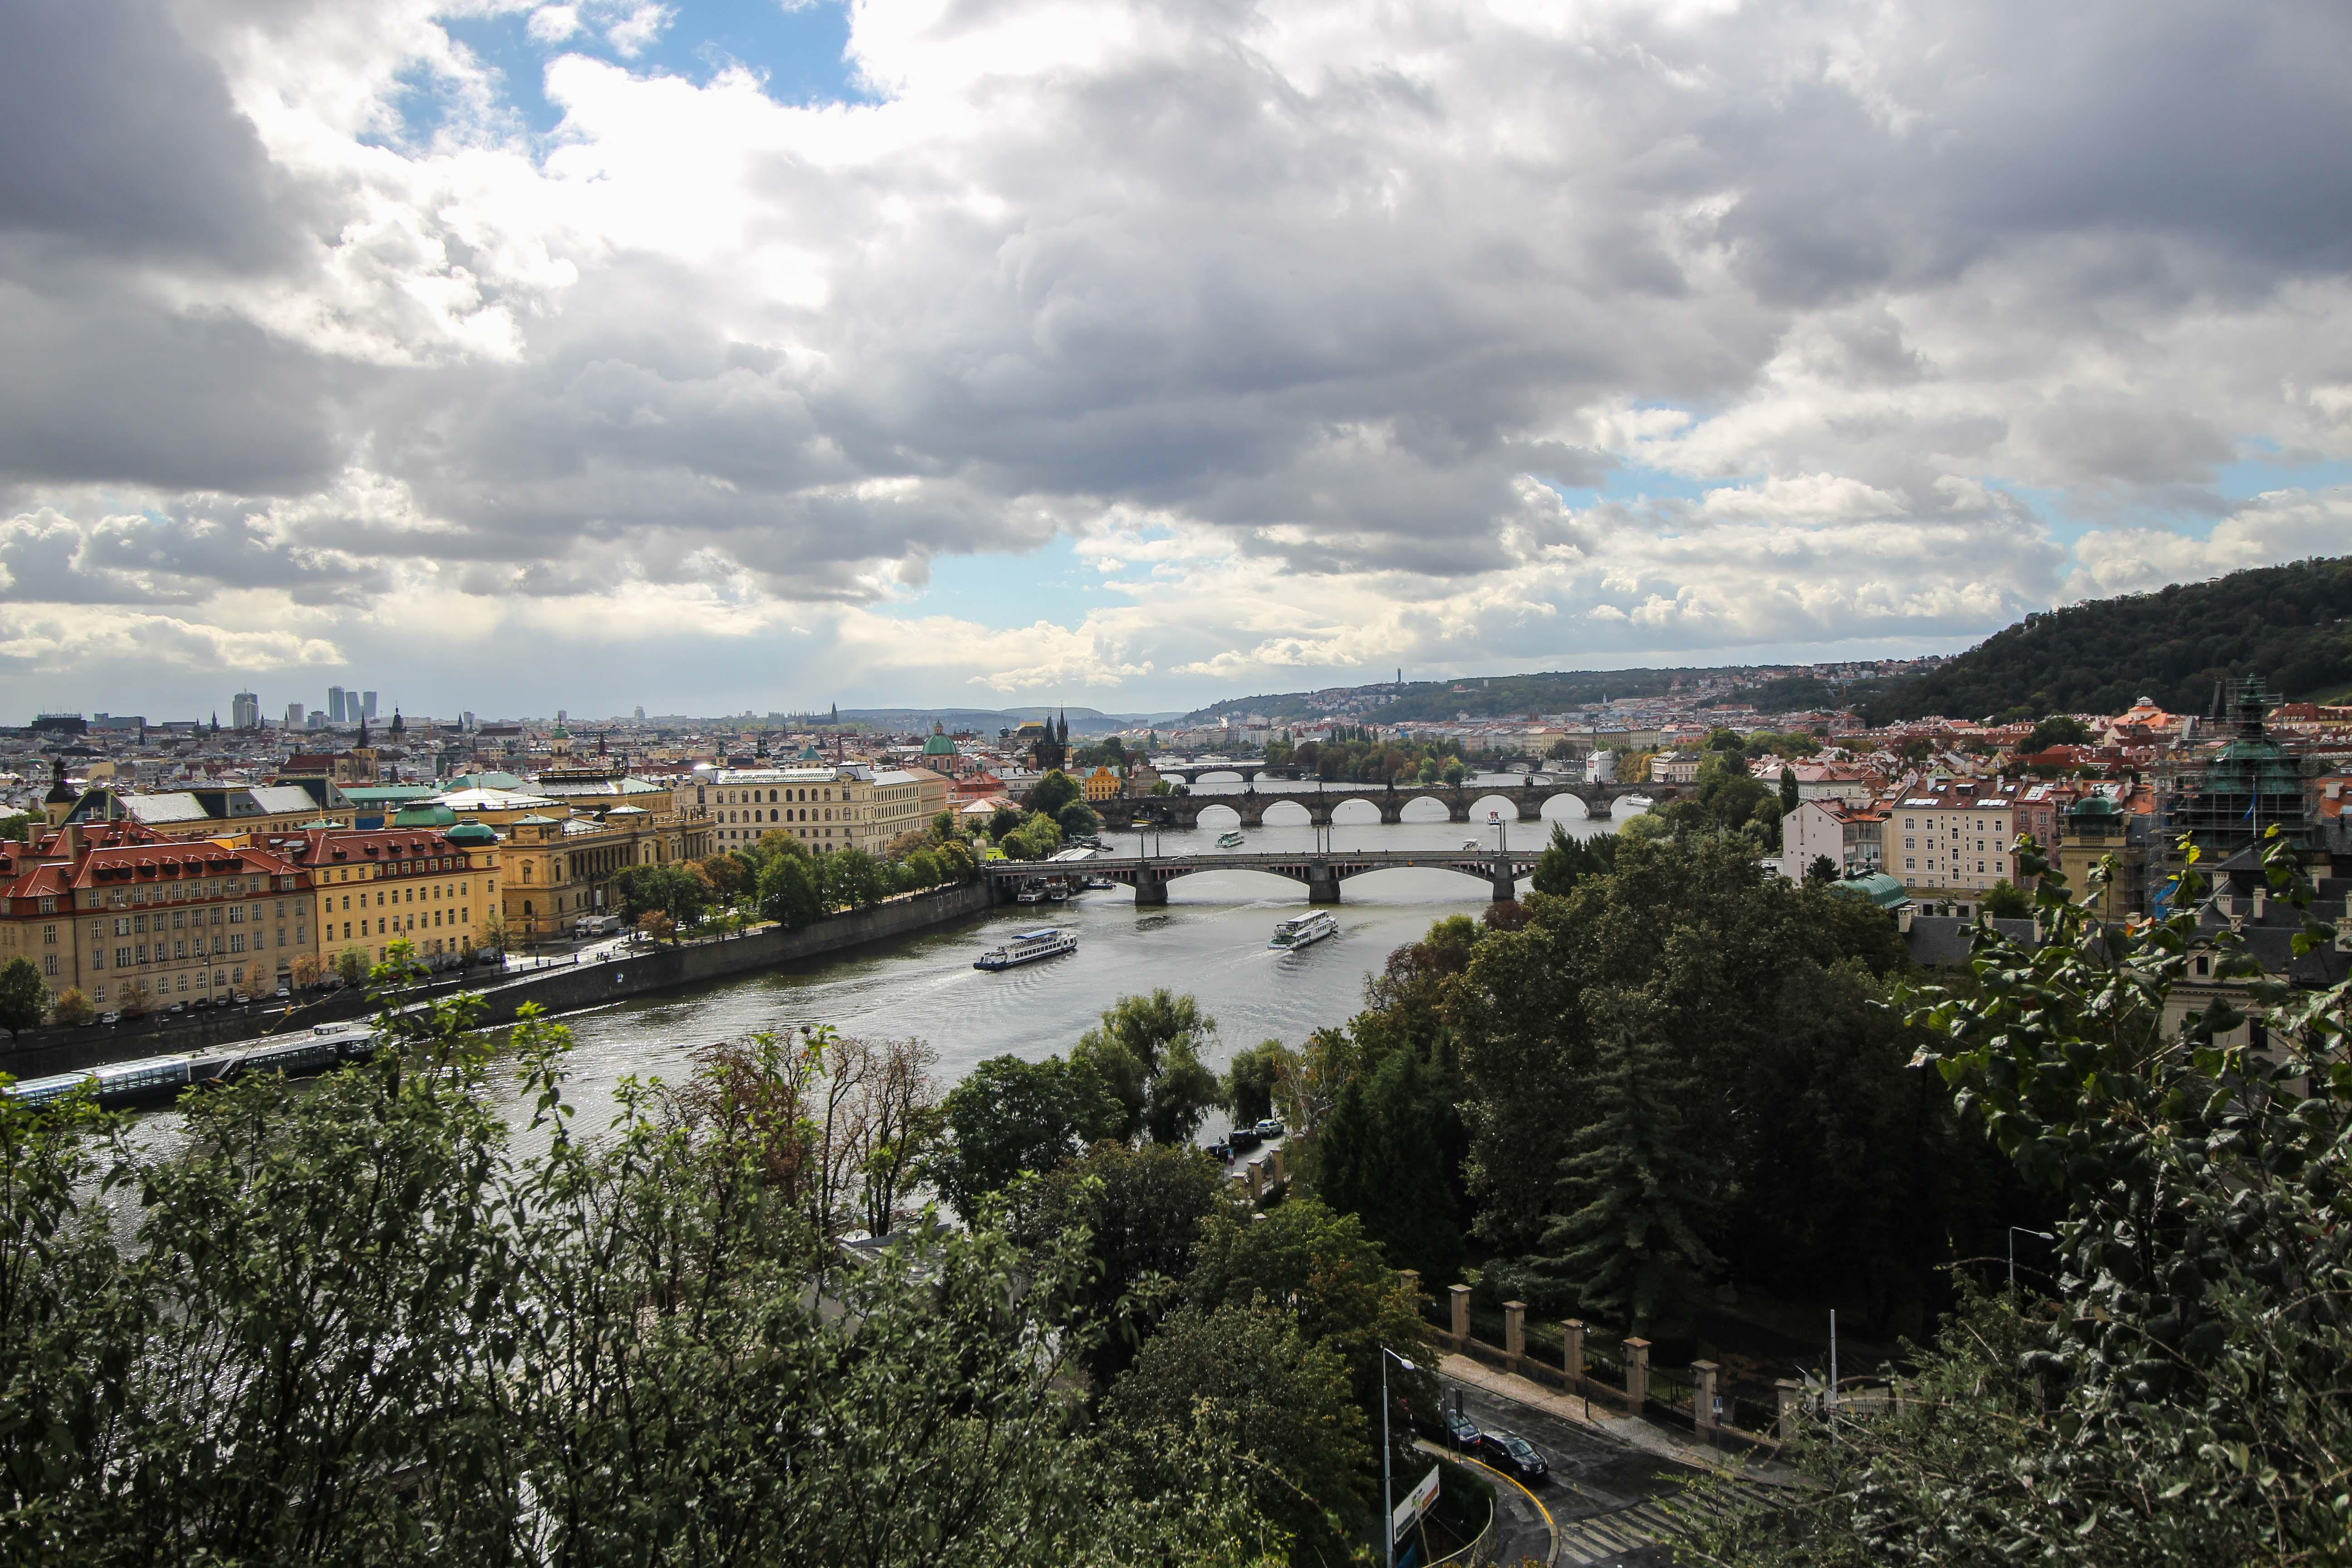 Top 10 Tipps Kurztrip Prag Letna Park Ausblick Blick Moldau Sehenswürdigkeiten Prag Insidertipps Reiseblog